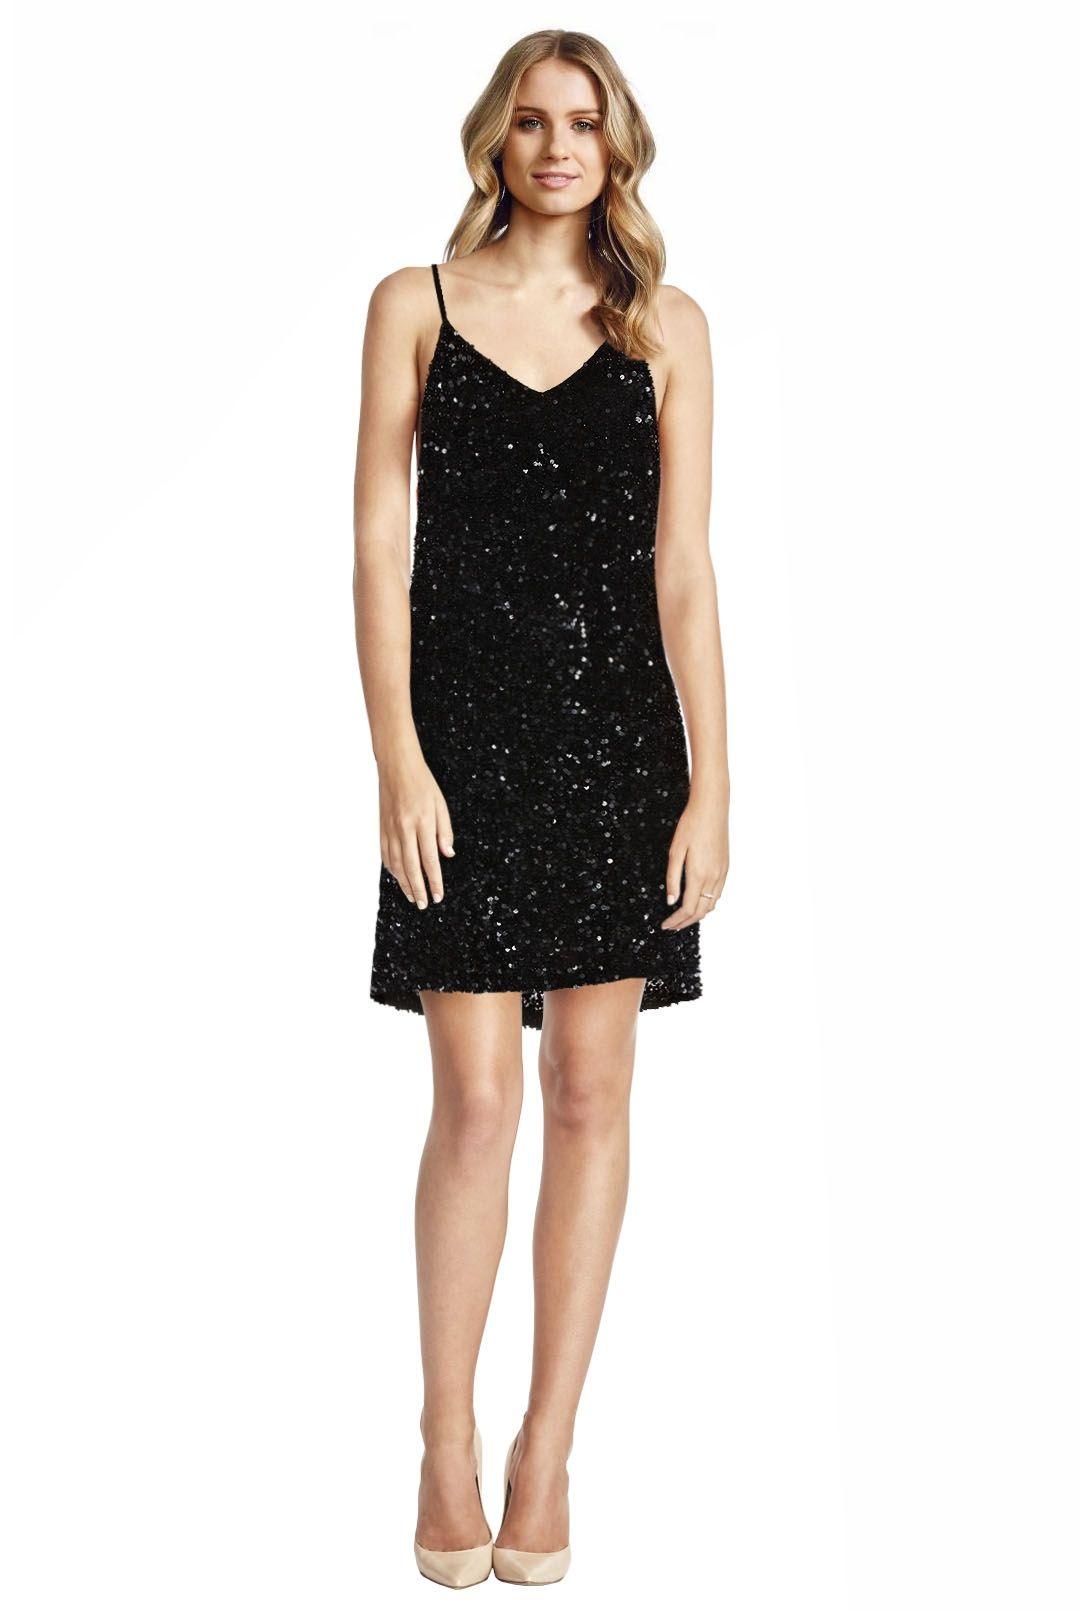 MLV - Olivia Mini Sequin Dress - Black - Front